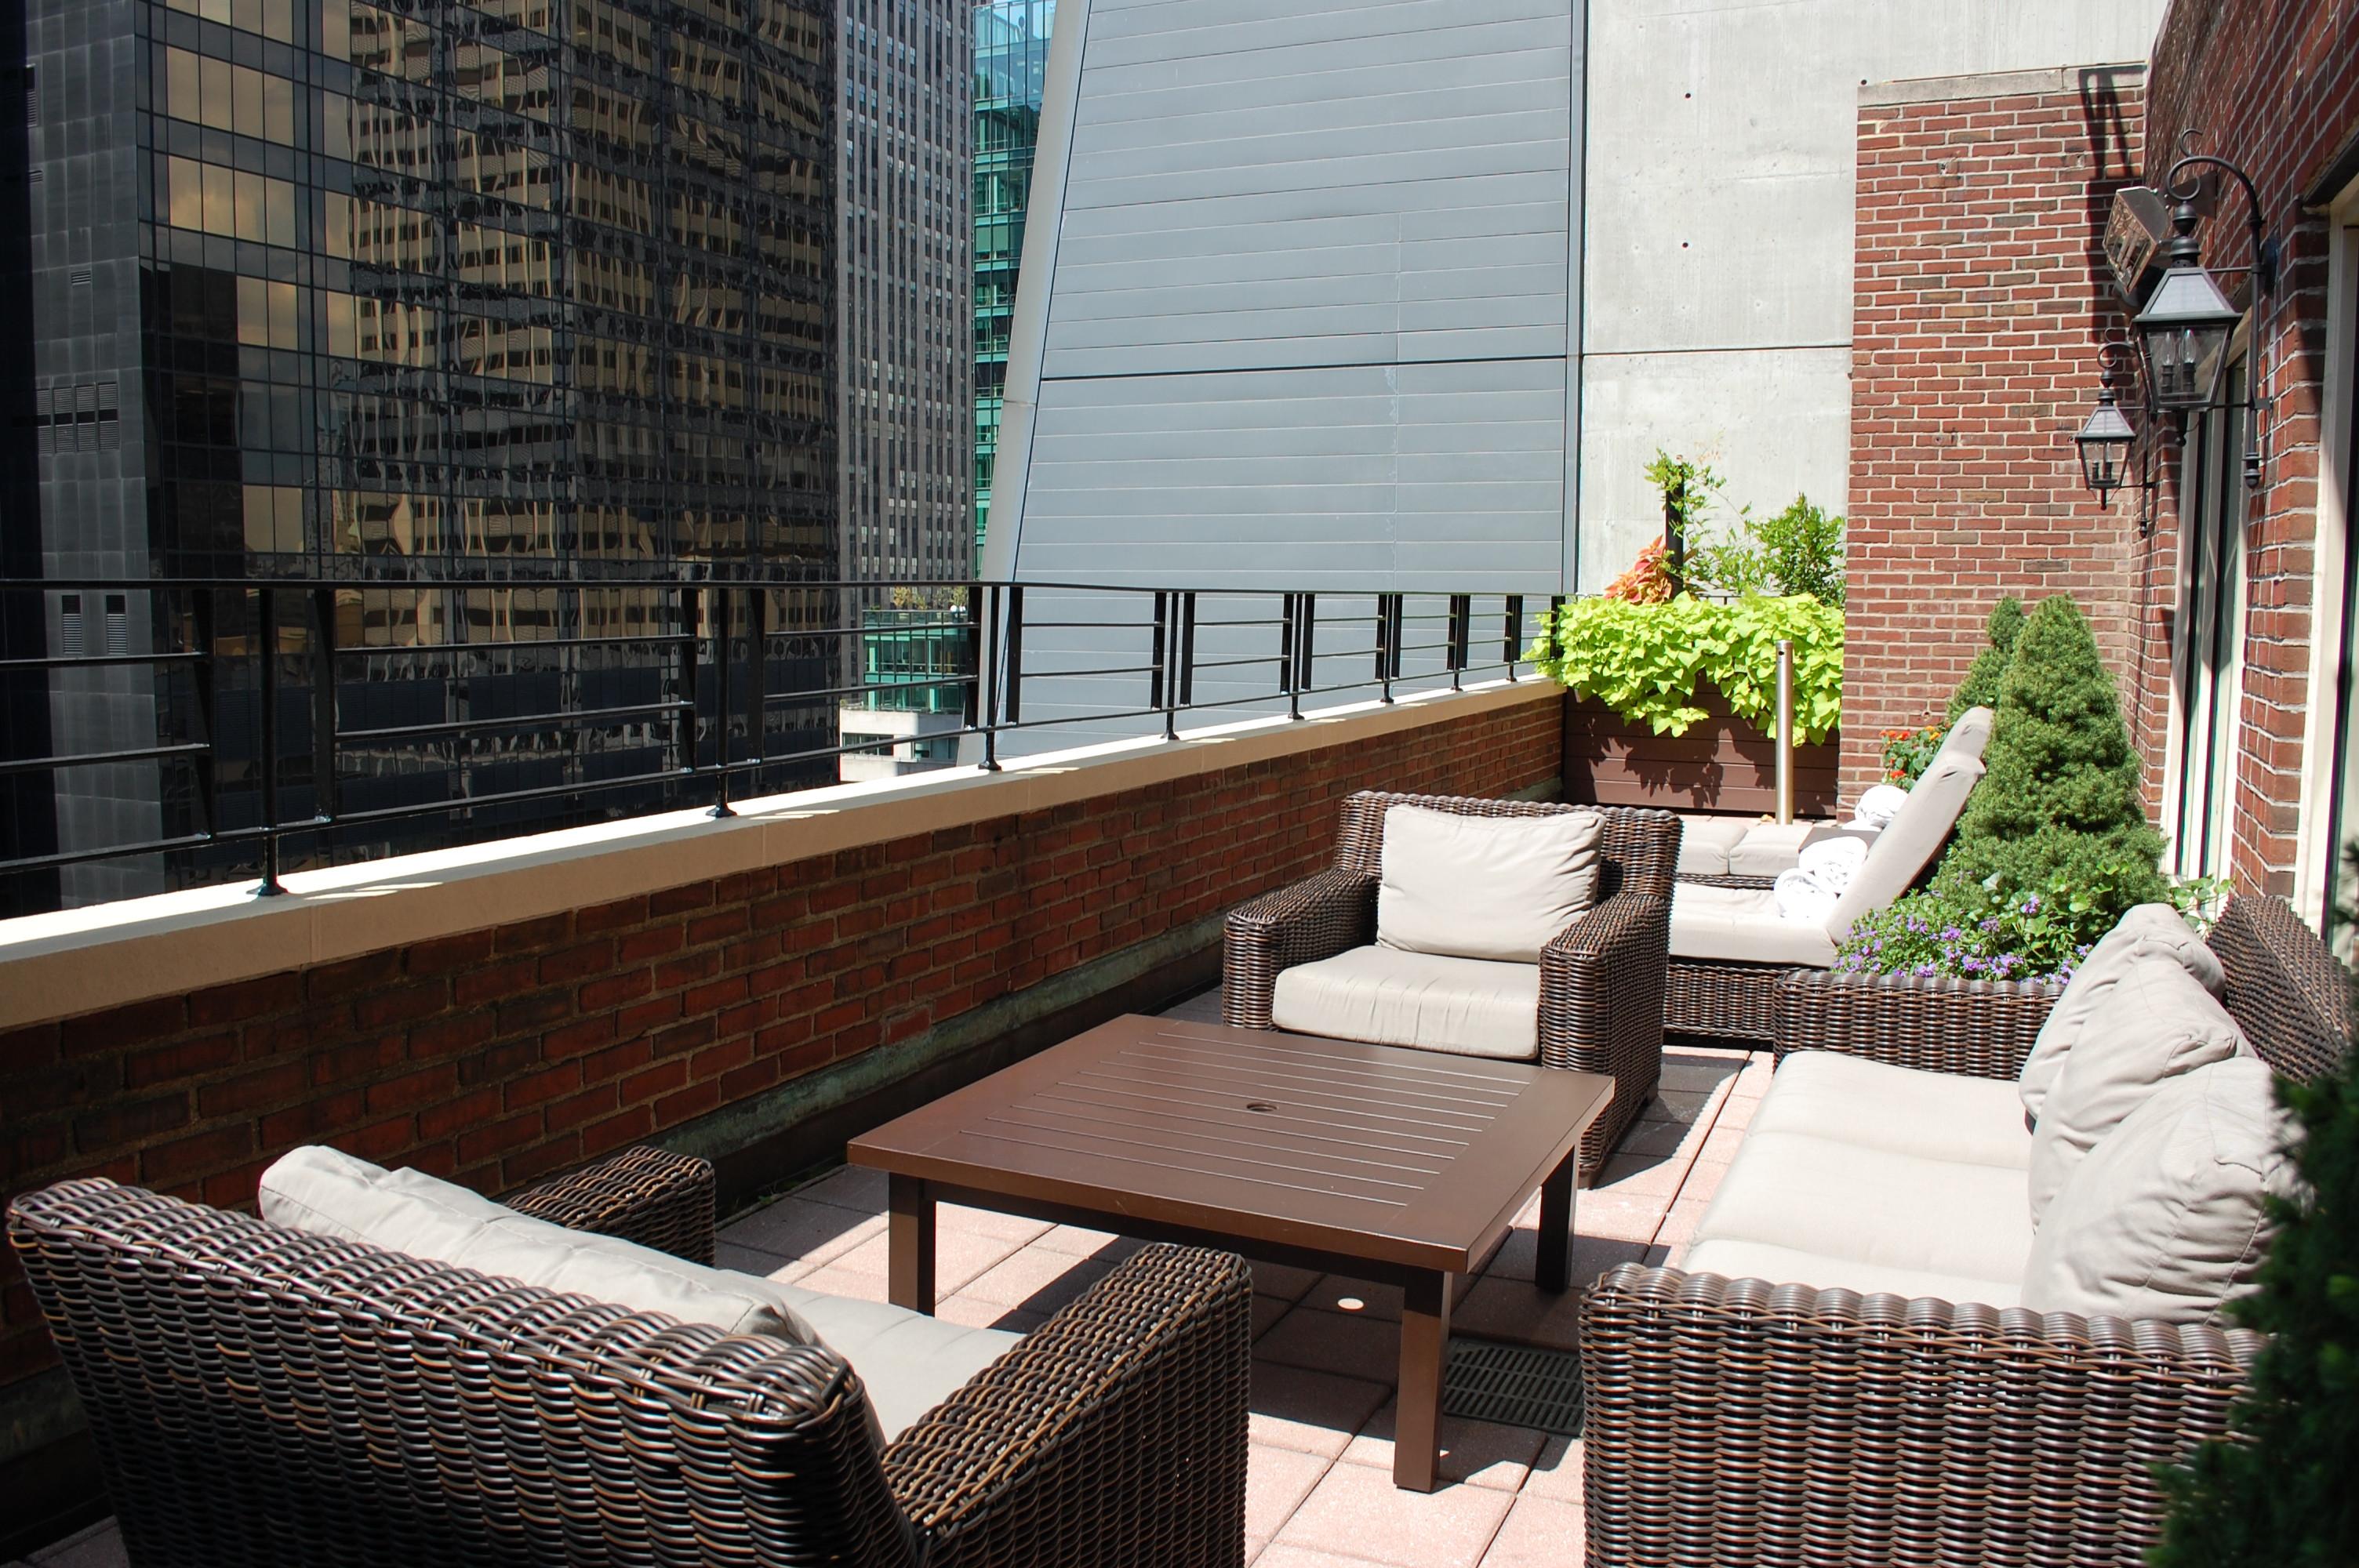 17th floor terrace